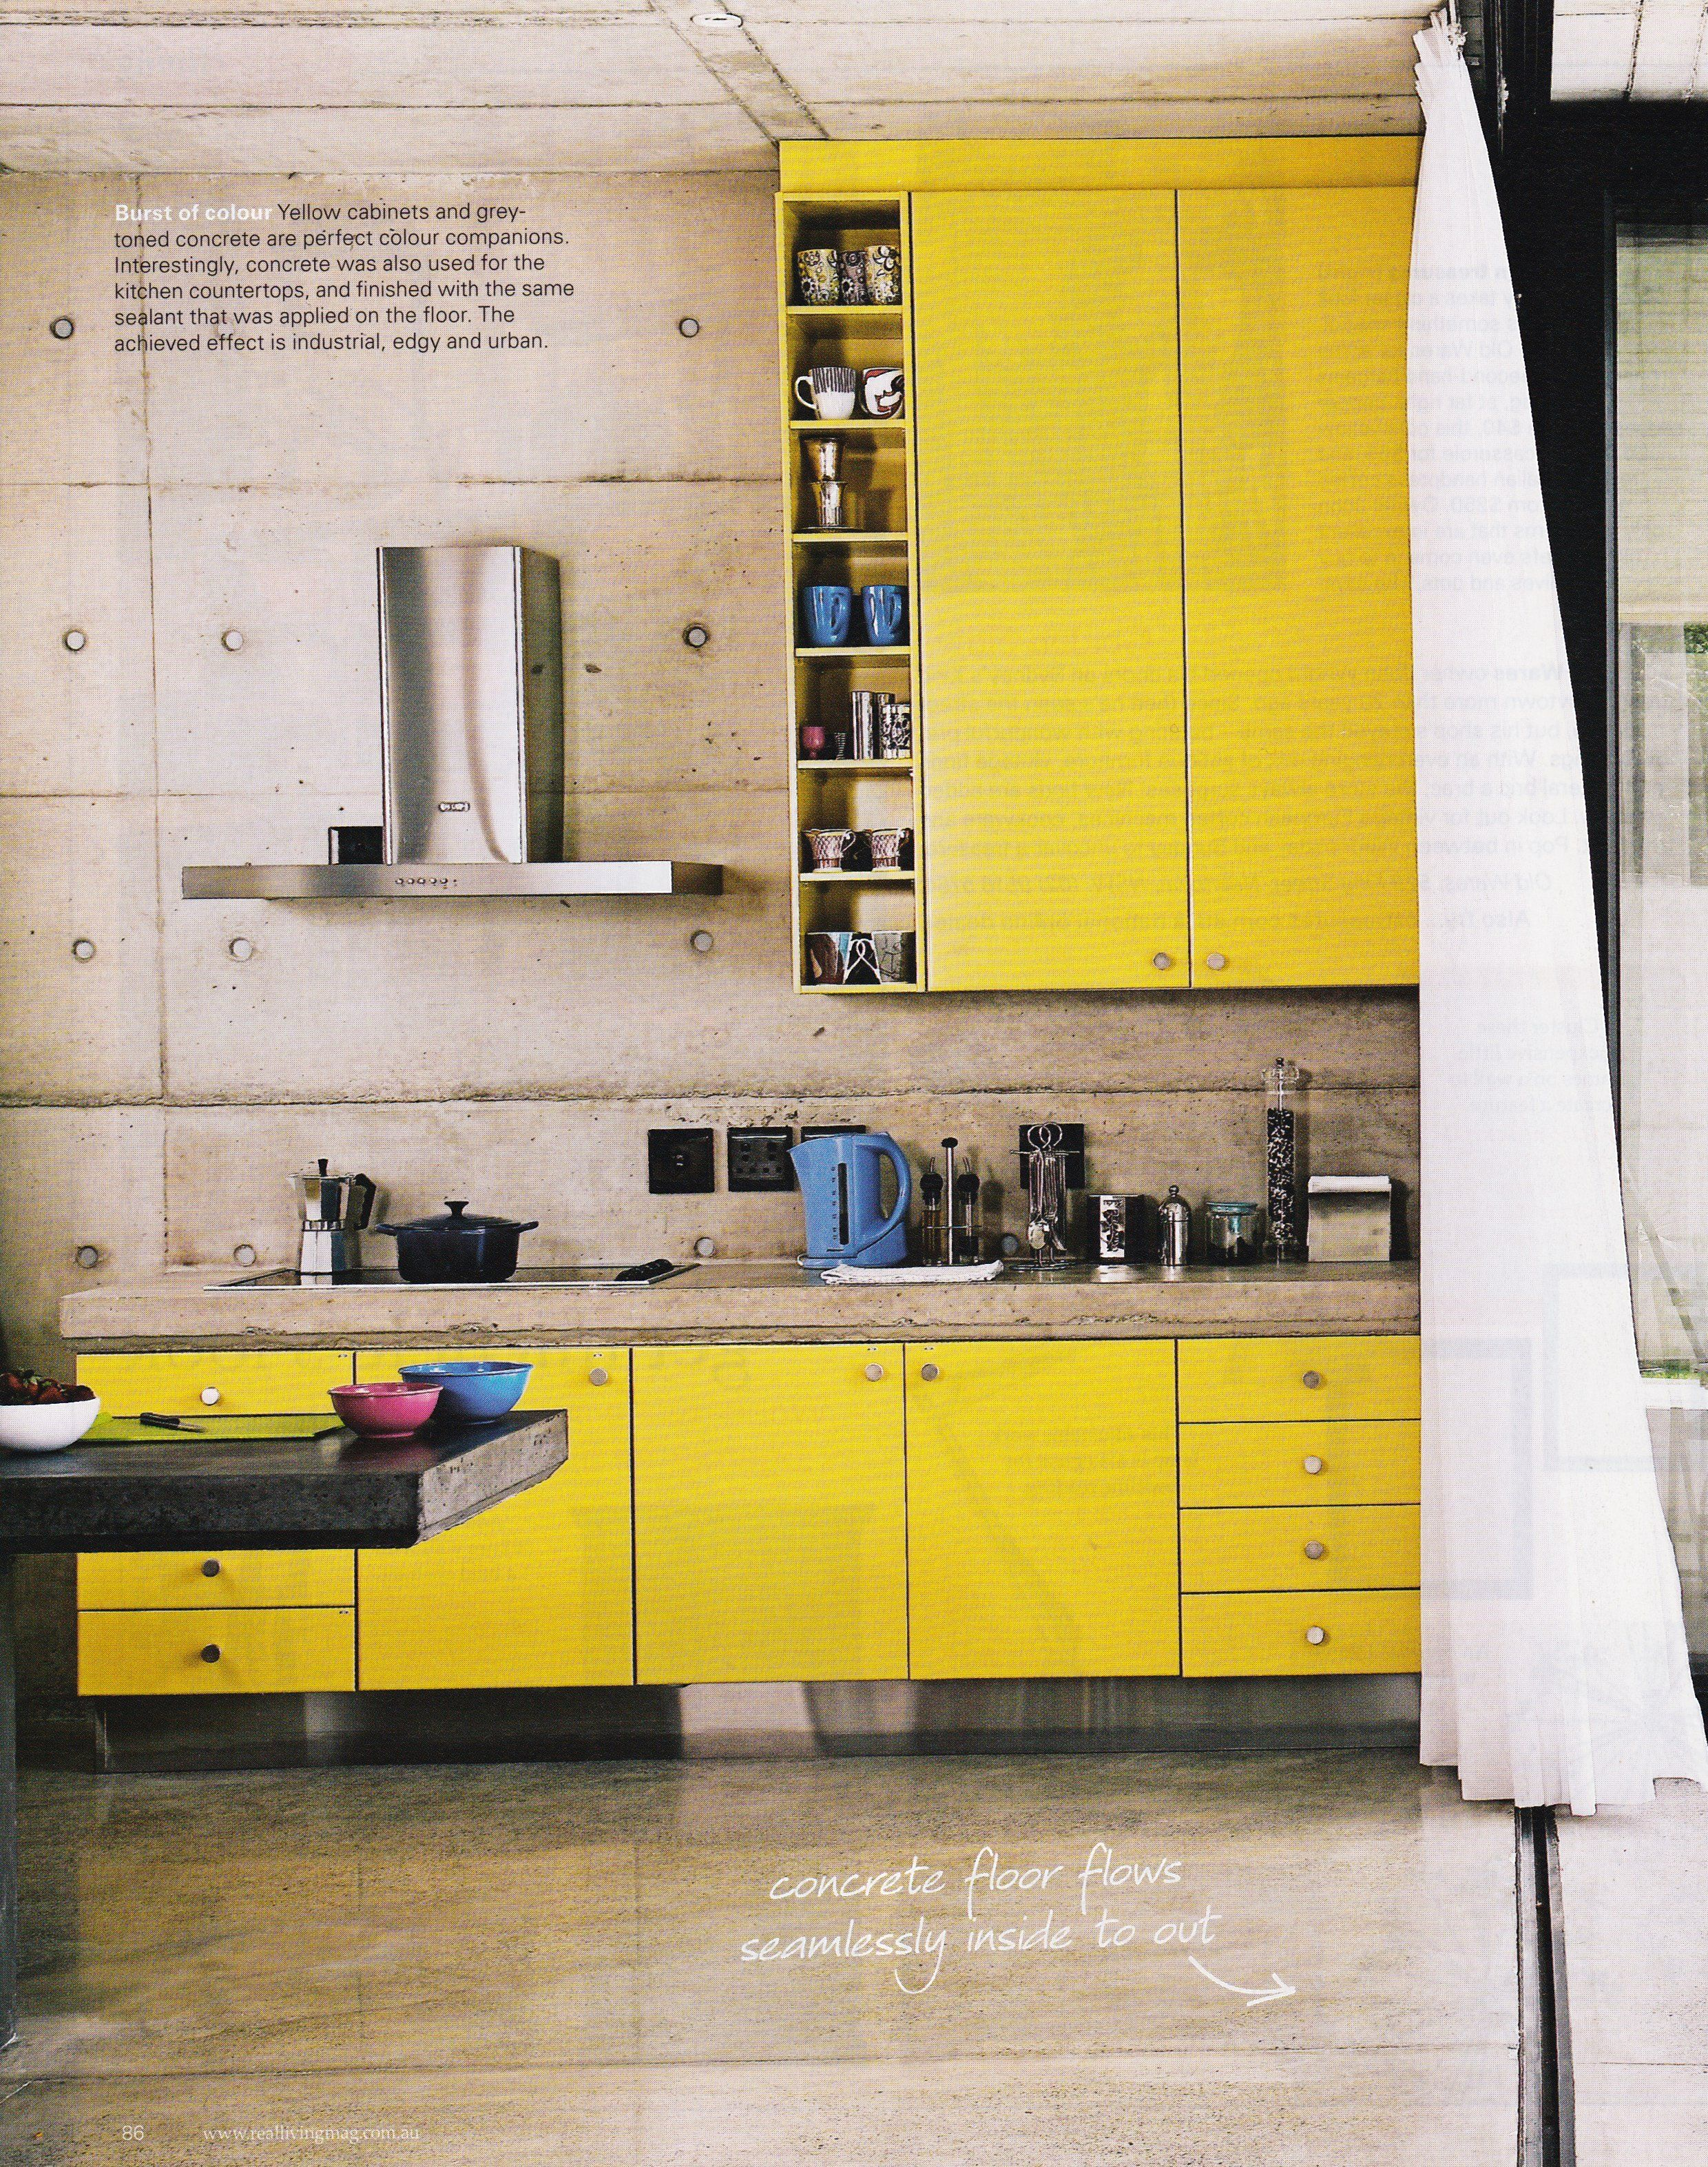 yellow kitchen | eat | Pinterest | Kitchens